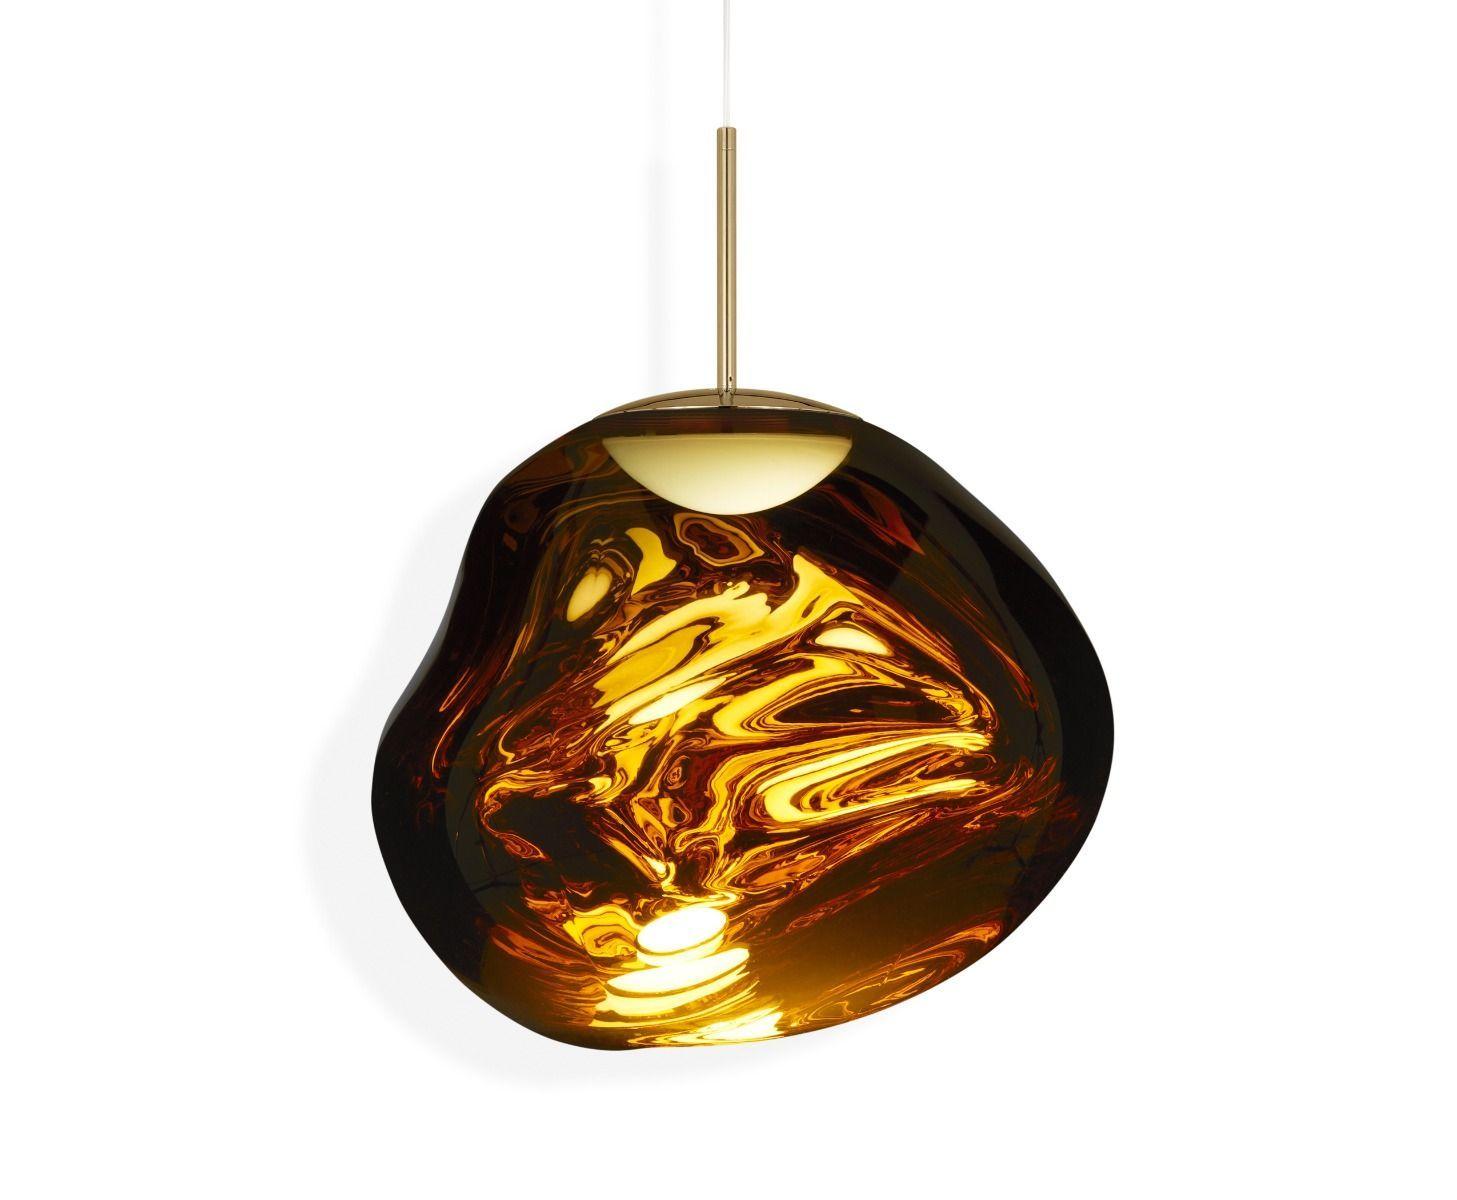 Melt Led Hanglamp Hanglamp Plafondverlichting Tom Dixon